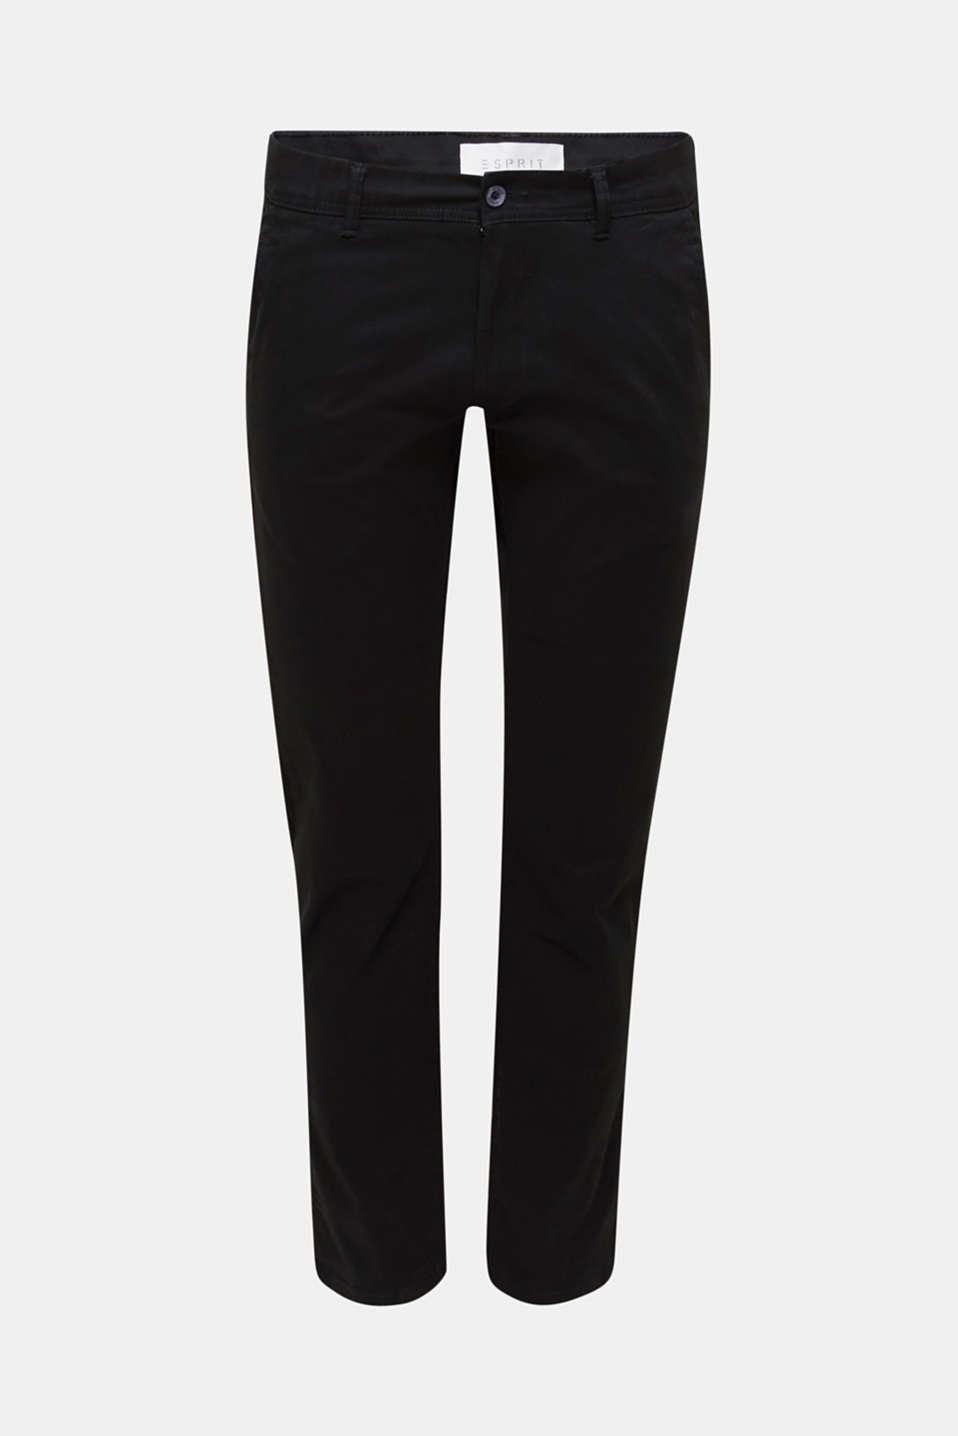 Pants woven Slim fit, BLACK, detail image number 6